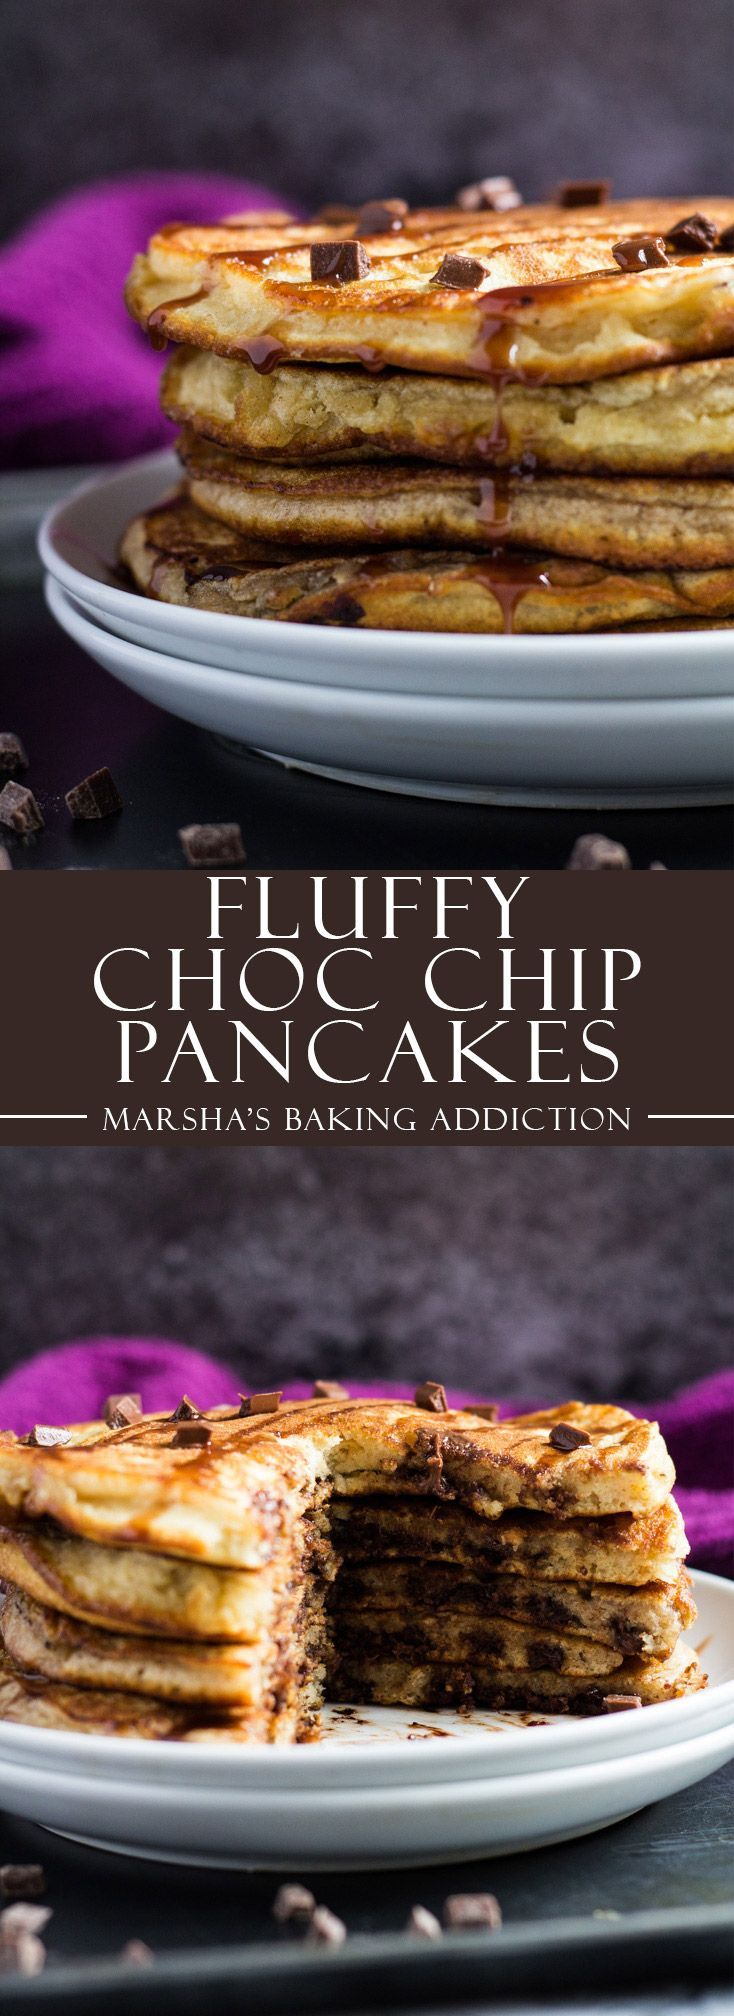 Fluffy Chocolate Chip Pancakes | http://marshasbakingaddiction.com /marshasbakeblog/